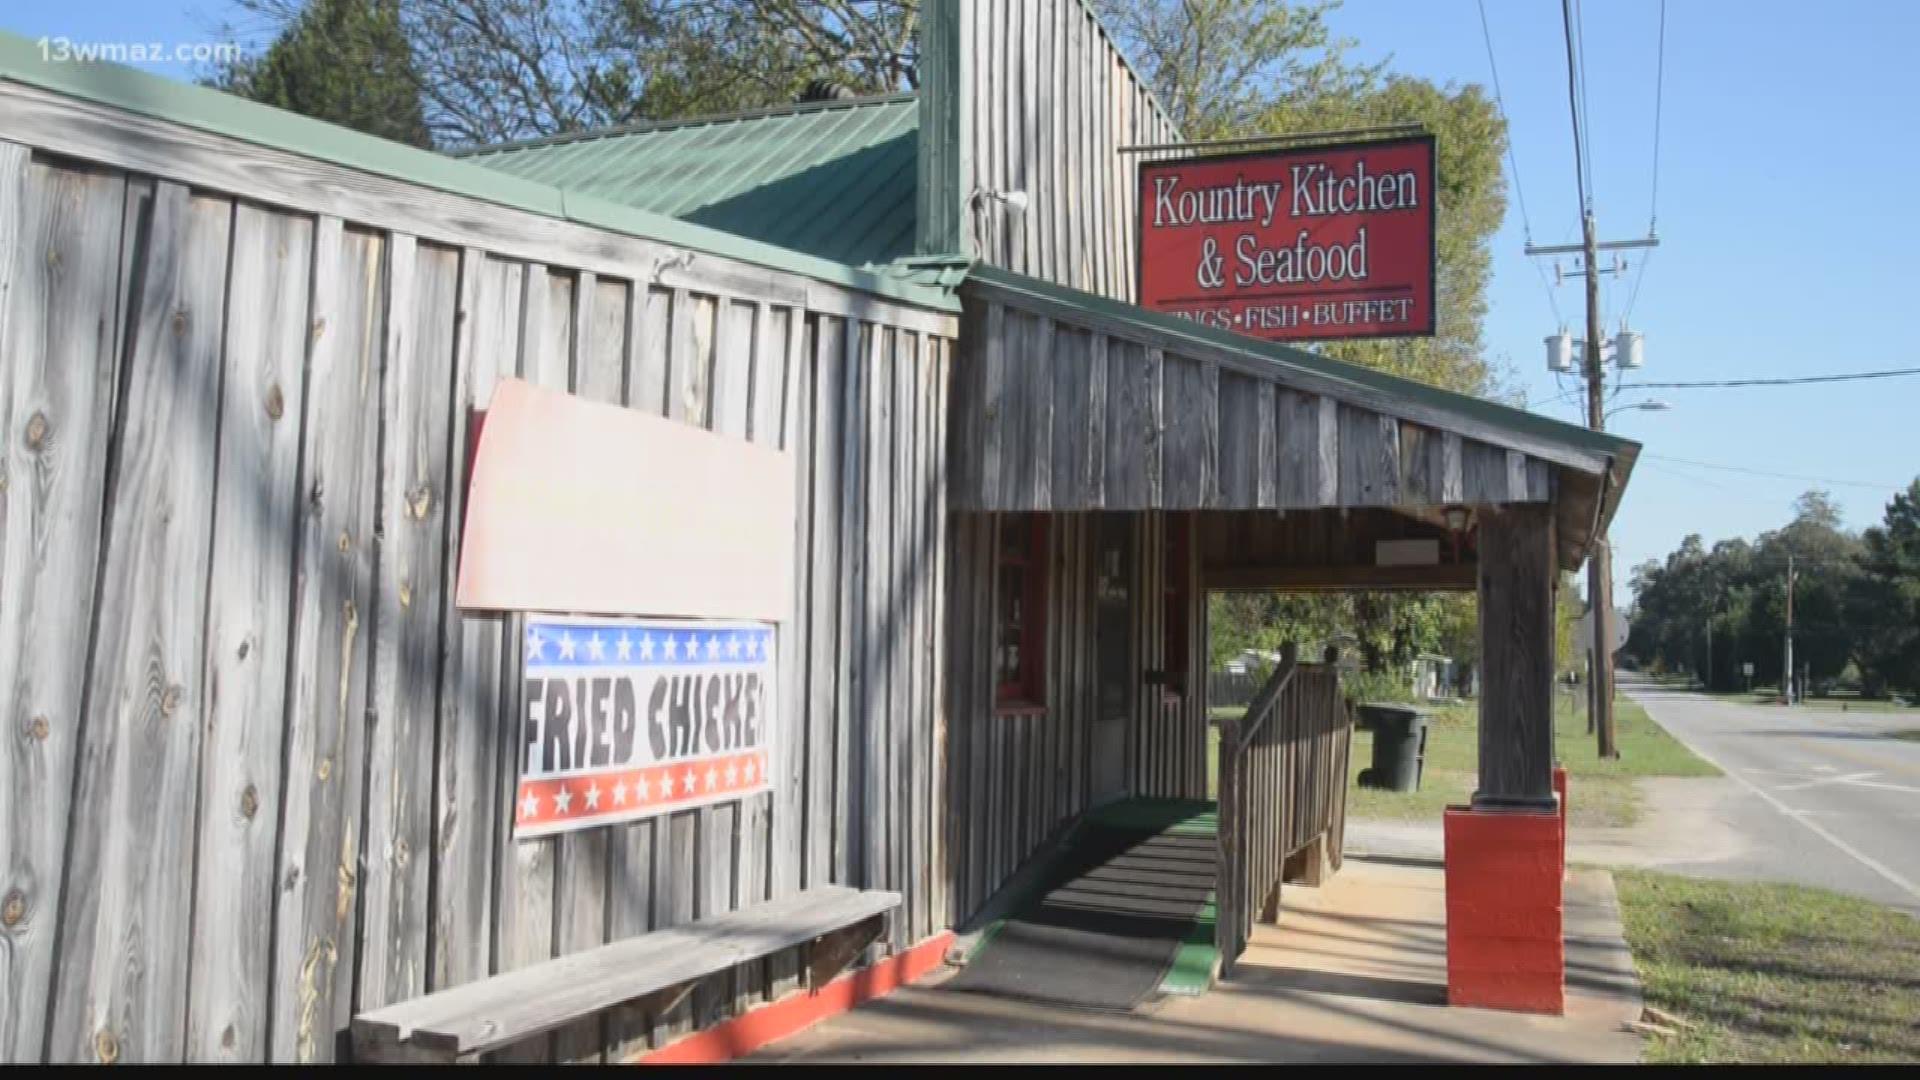 Corner Cafes Kountry Kitchen Seafood In Jeffersonville 13wmaz Com